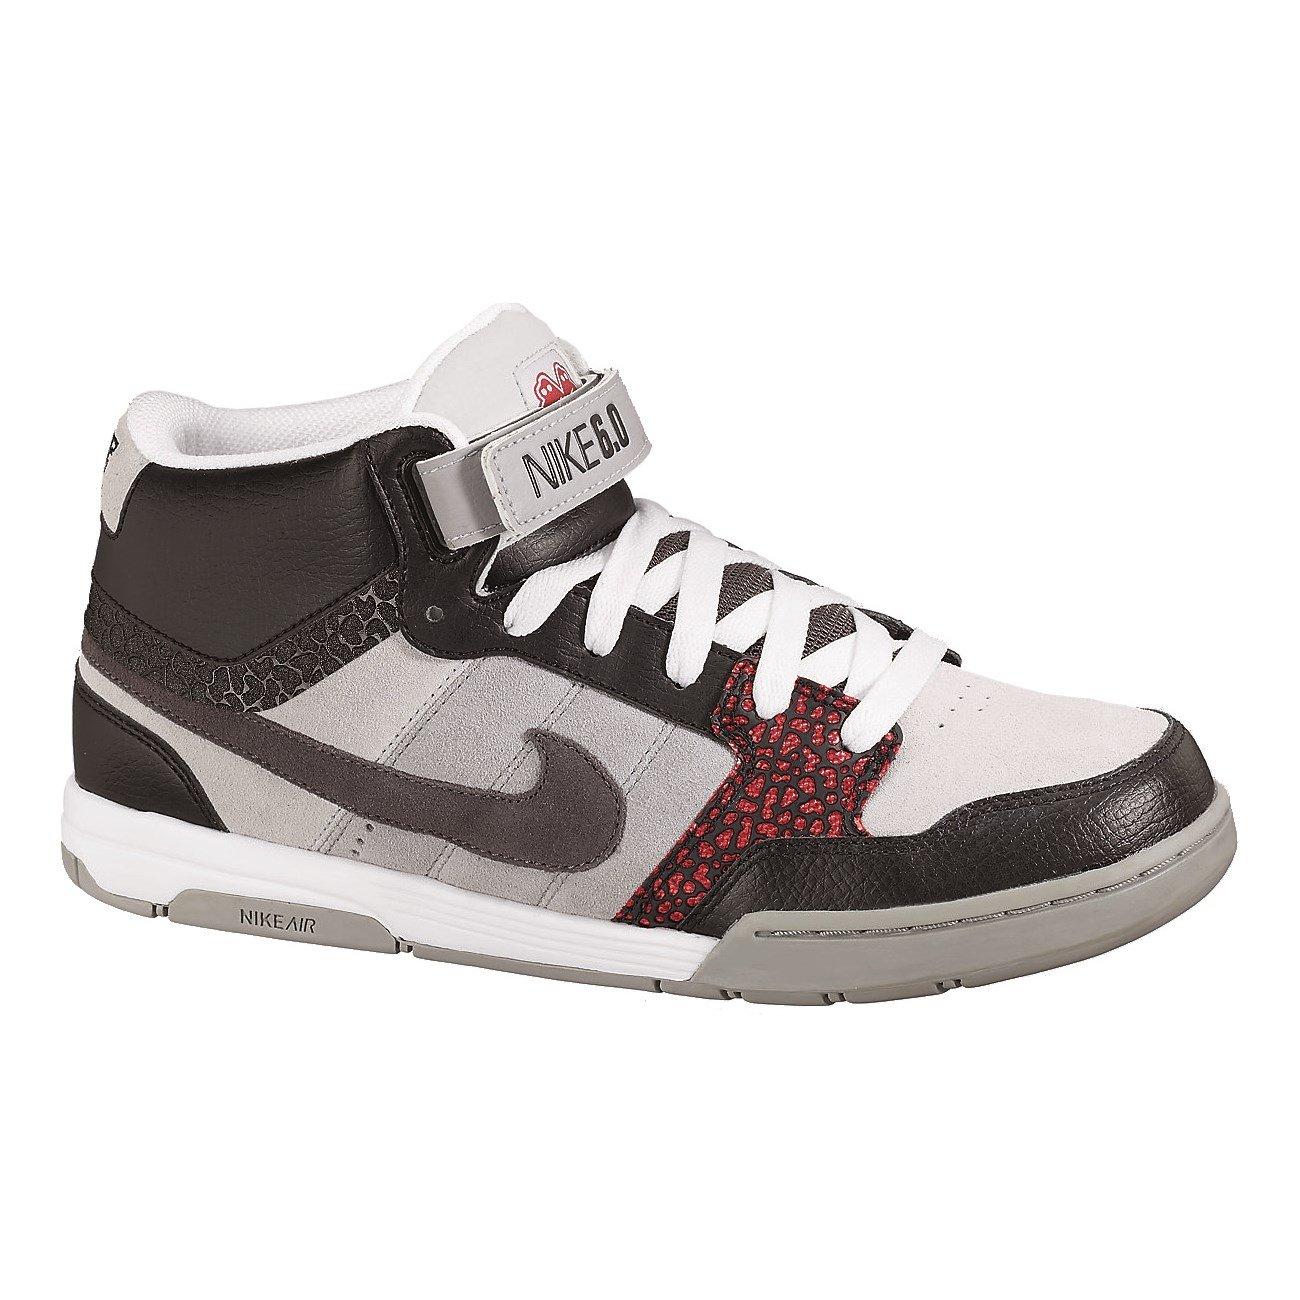 Nike 6.0 Air Mogan Mid Shoes   evo